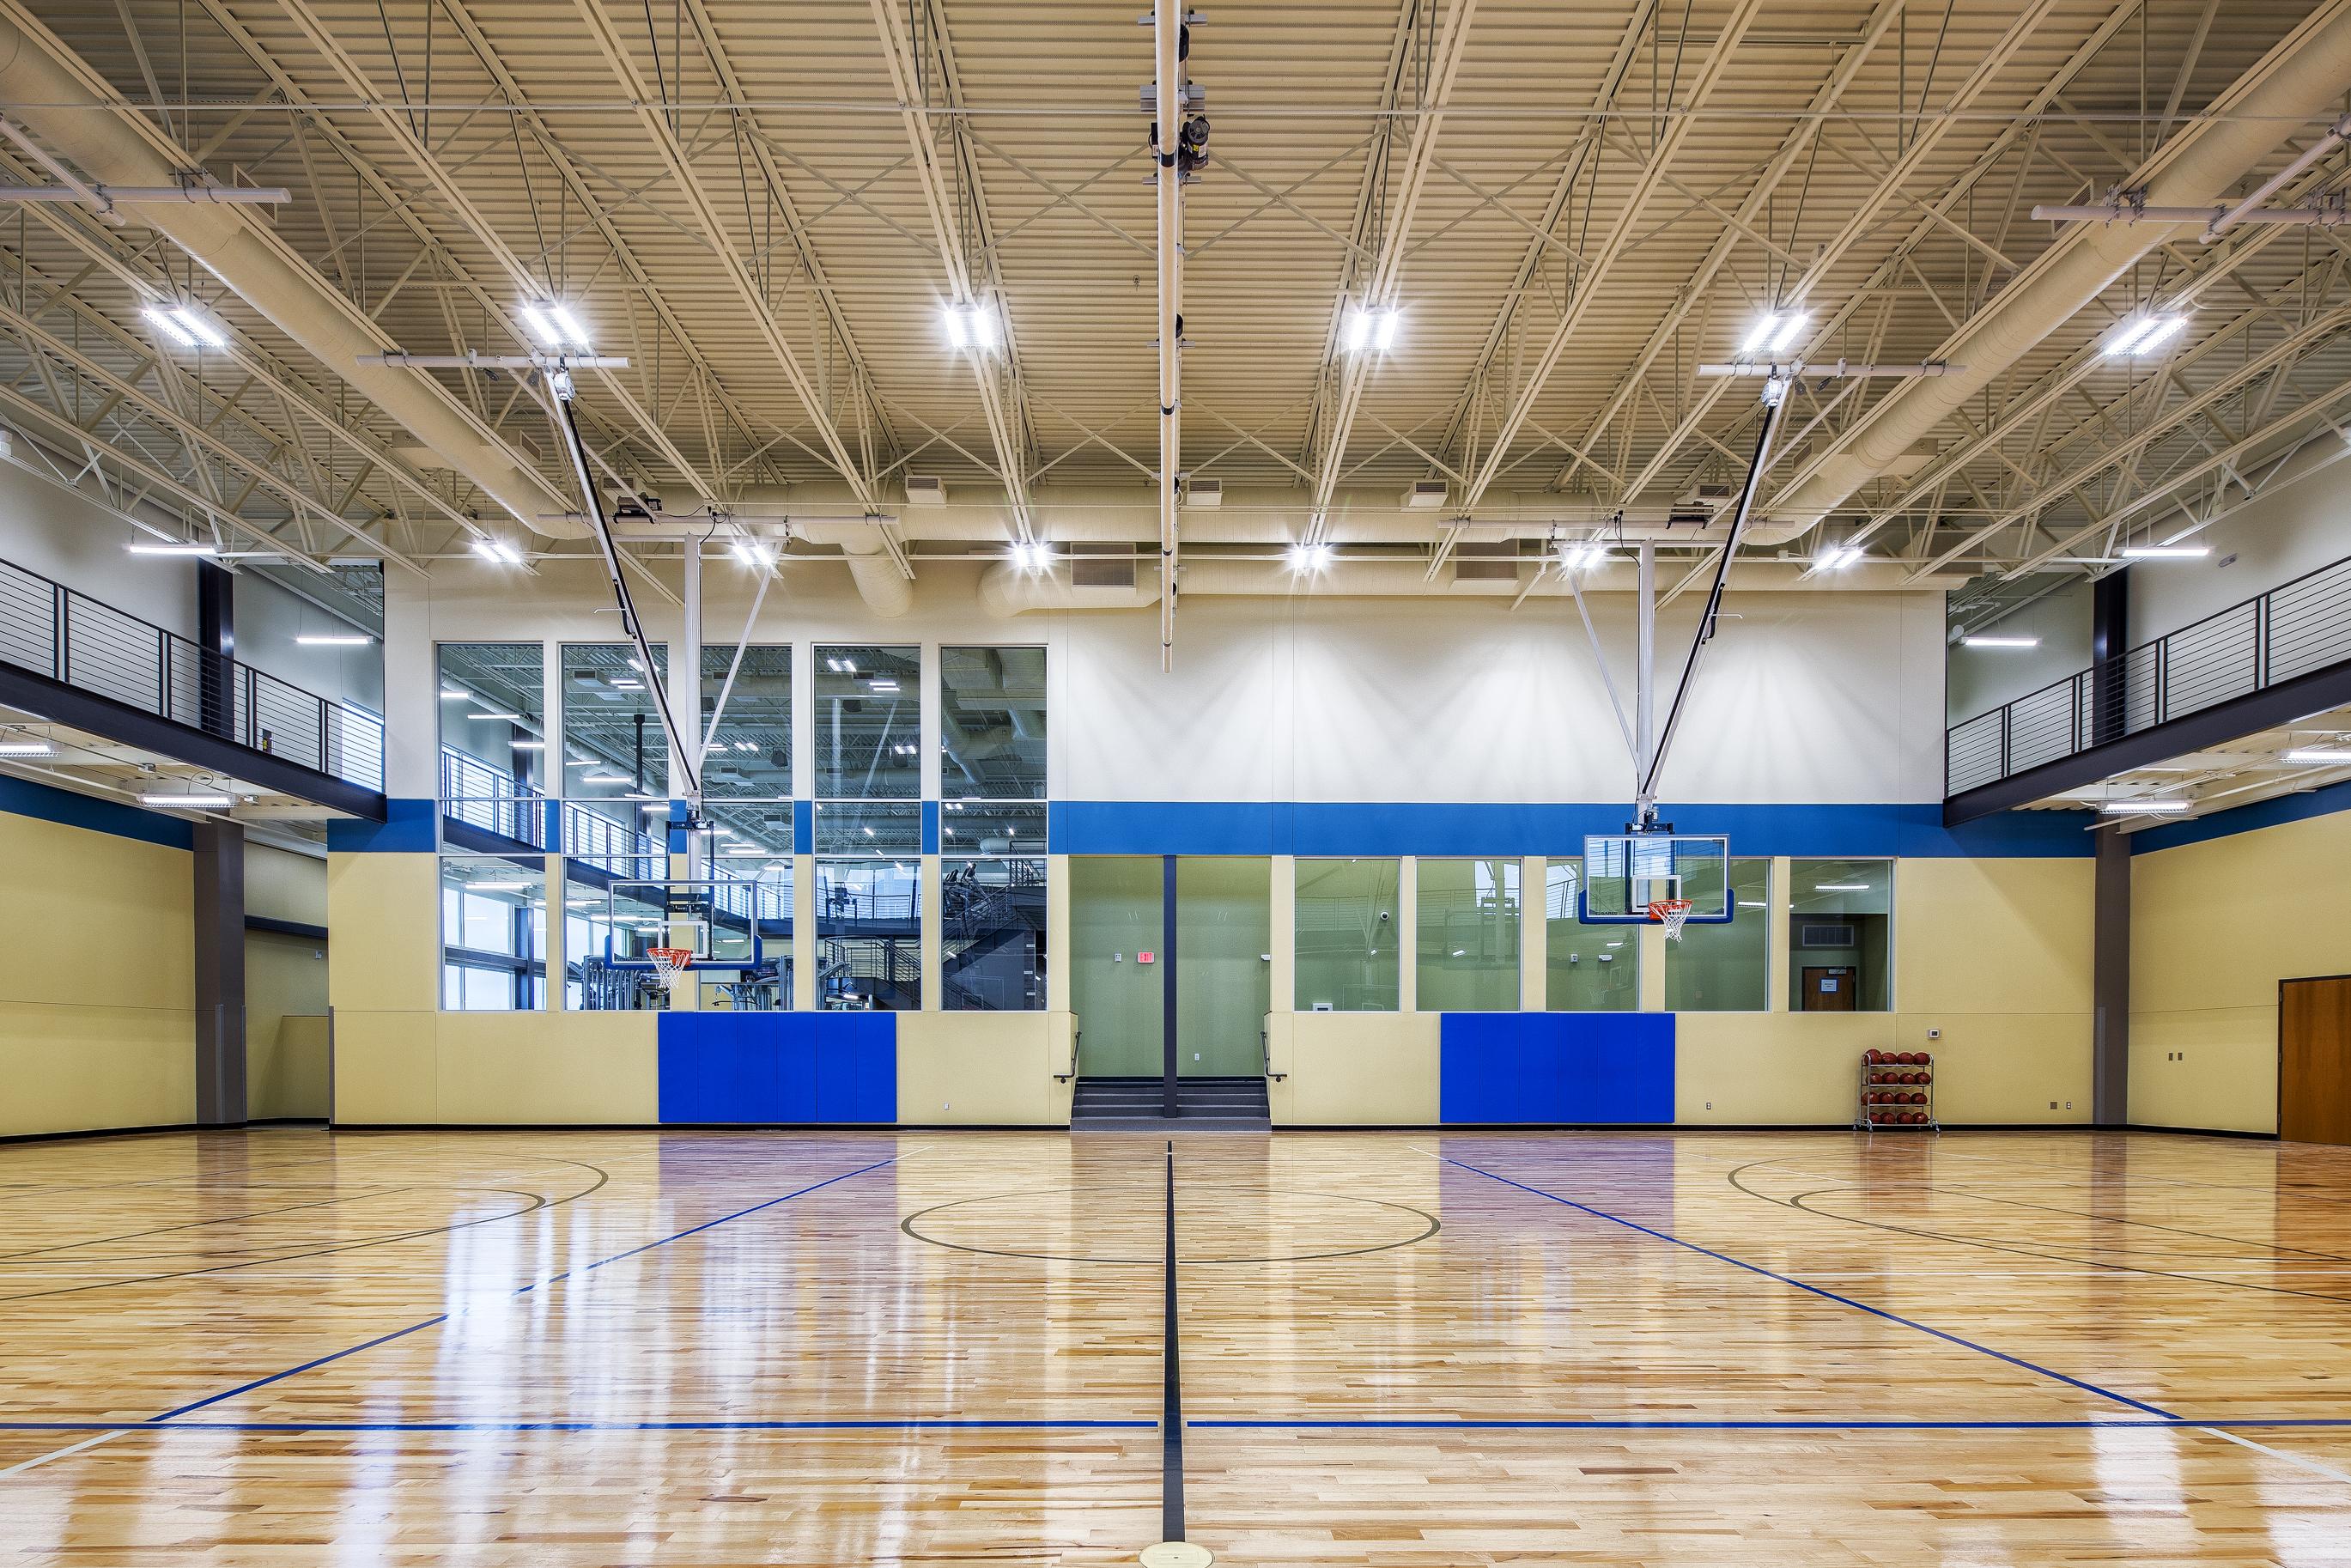 Energy Wellness Center basketball court